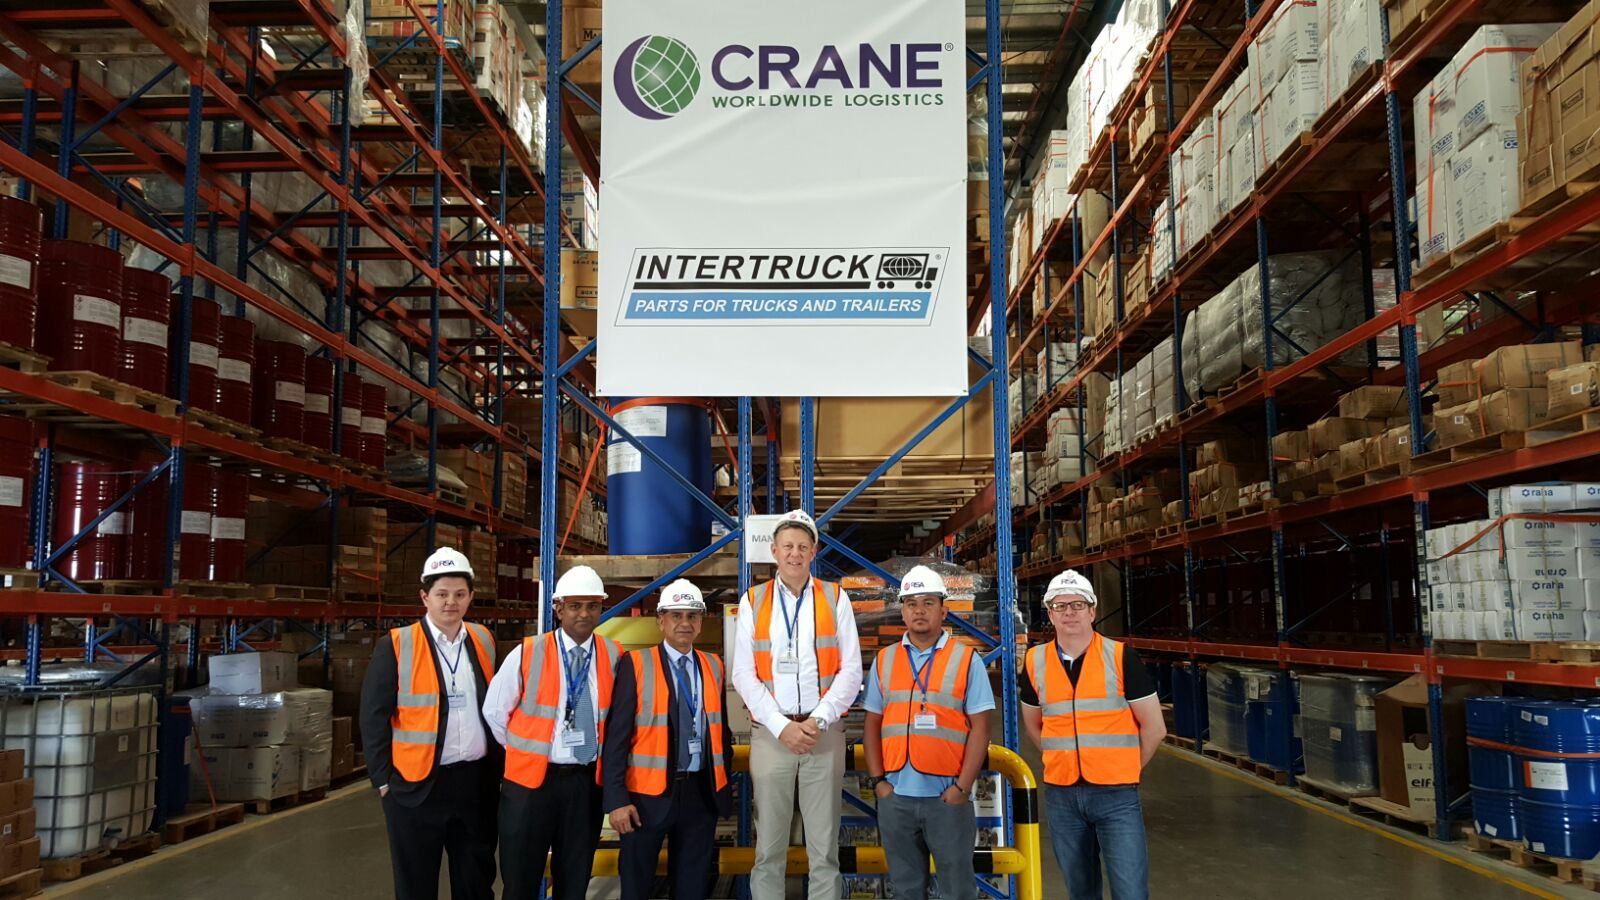 KSA: Crane Worldwide Logistics sets foot in Dammam